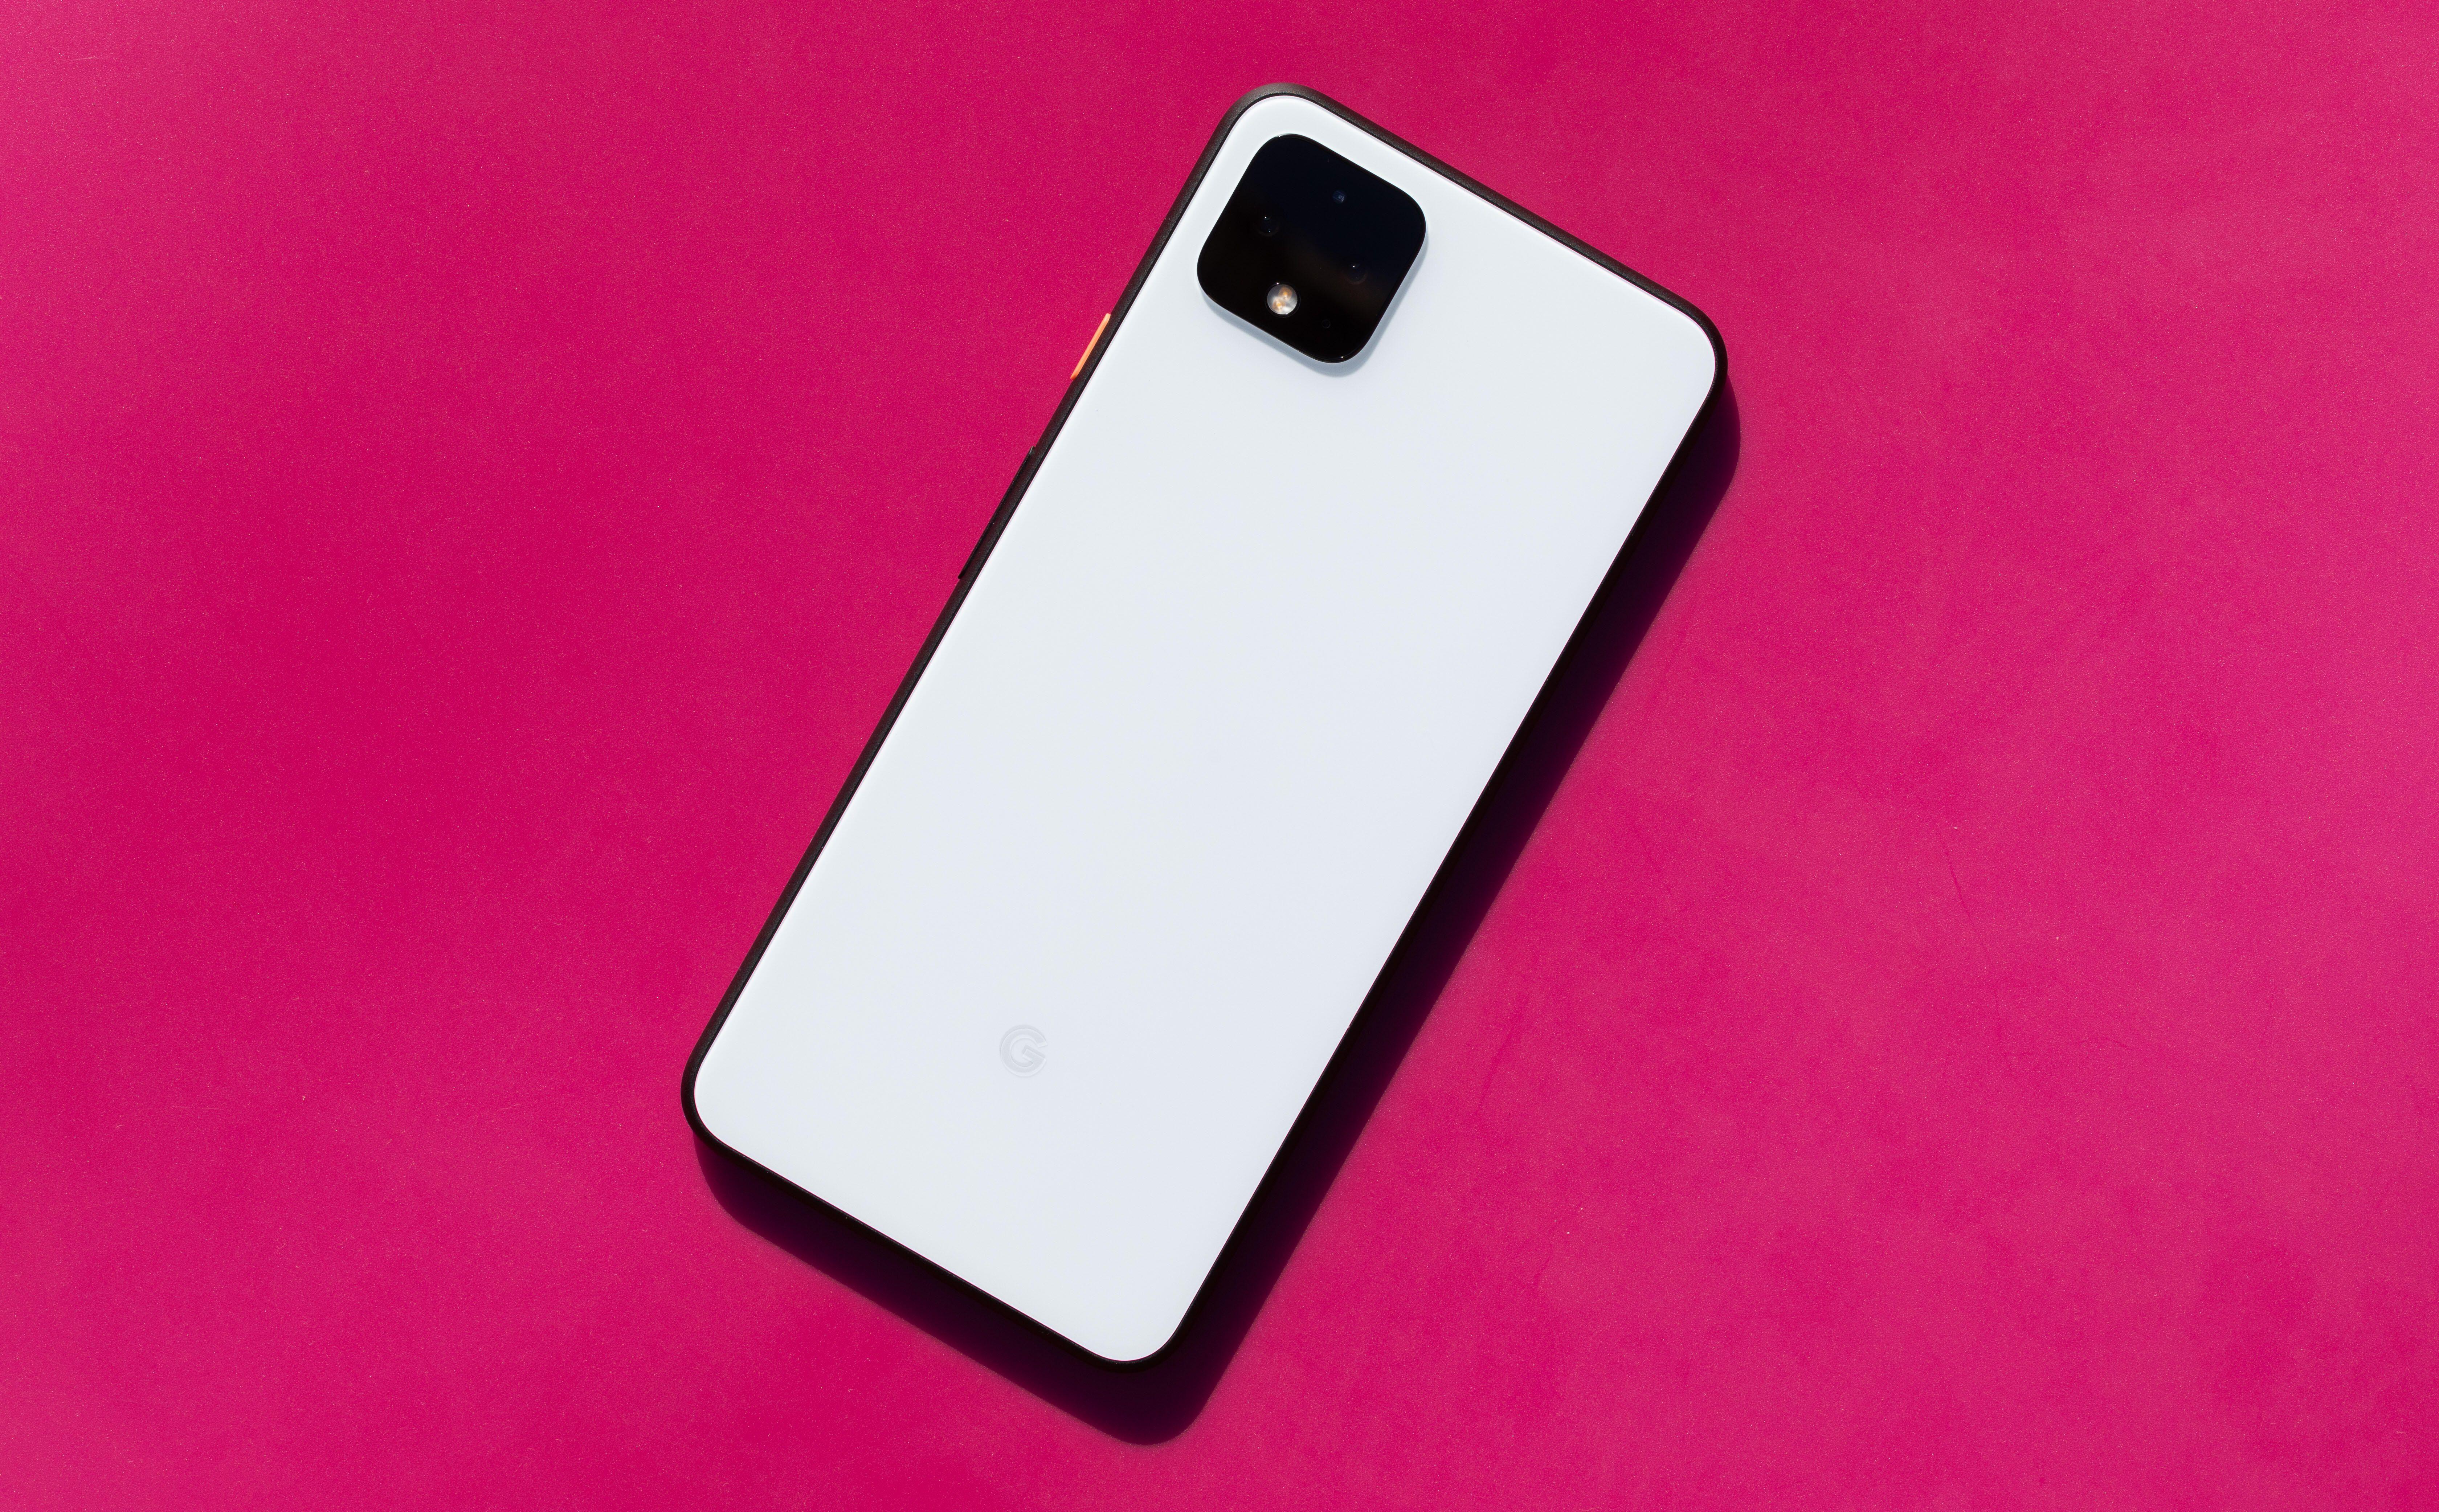 Google's Pixel 4 XL phone